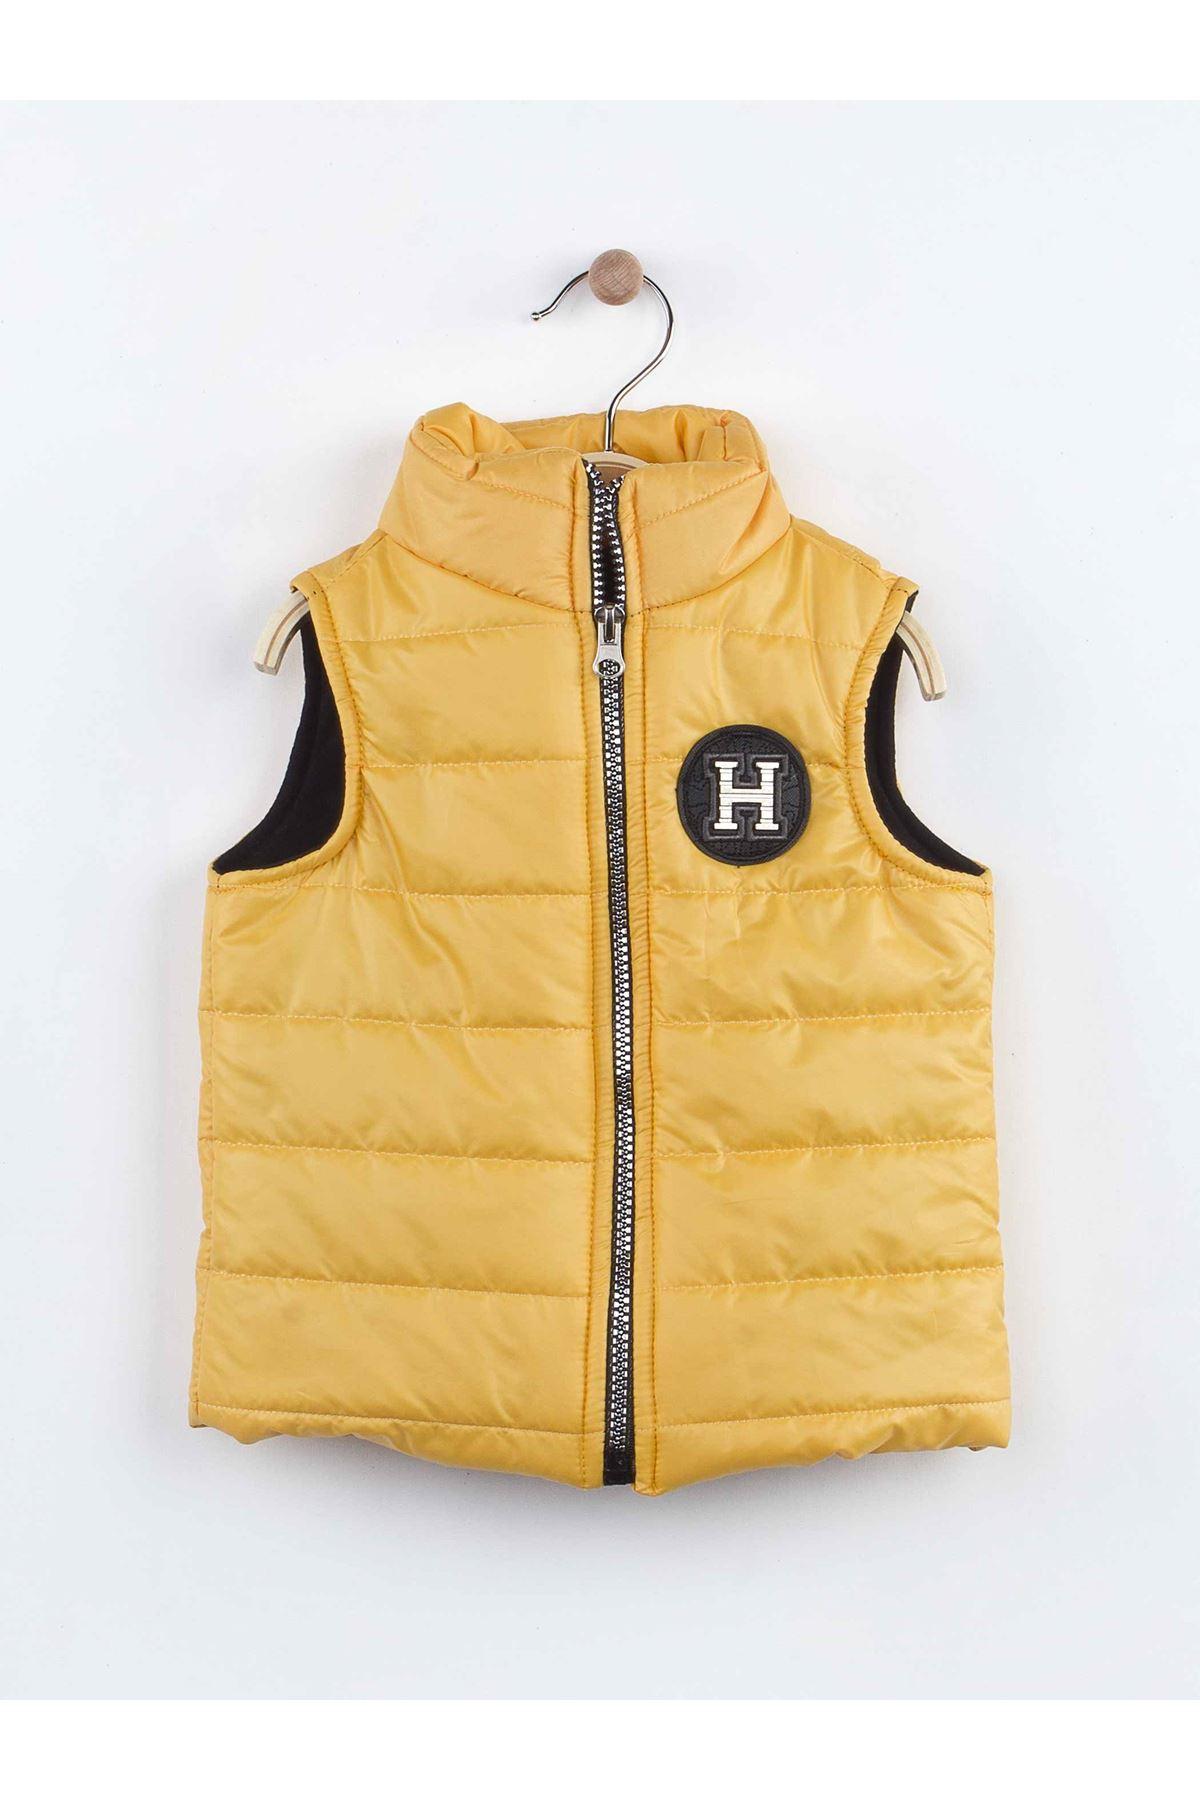 Yellow gray vest 3 piece tracksuit set bottom tracksuit top sweat seasonal suit boys models